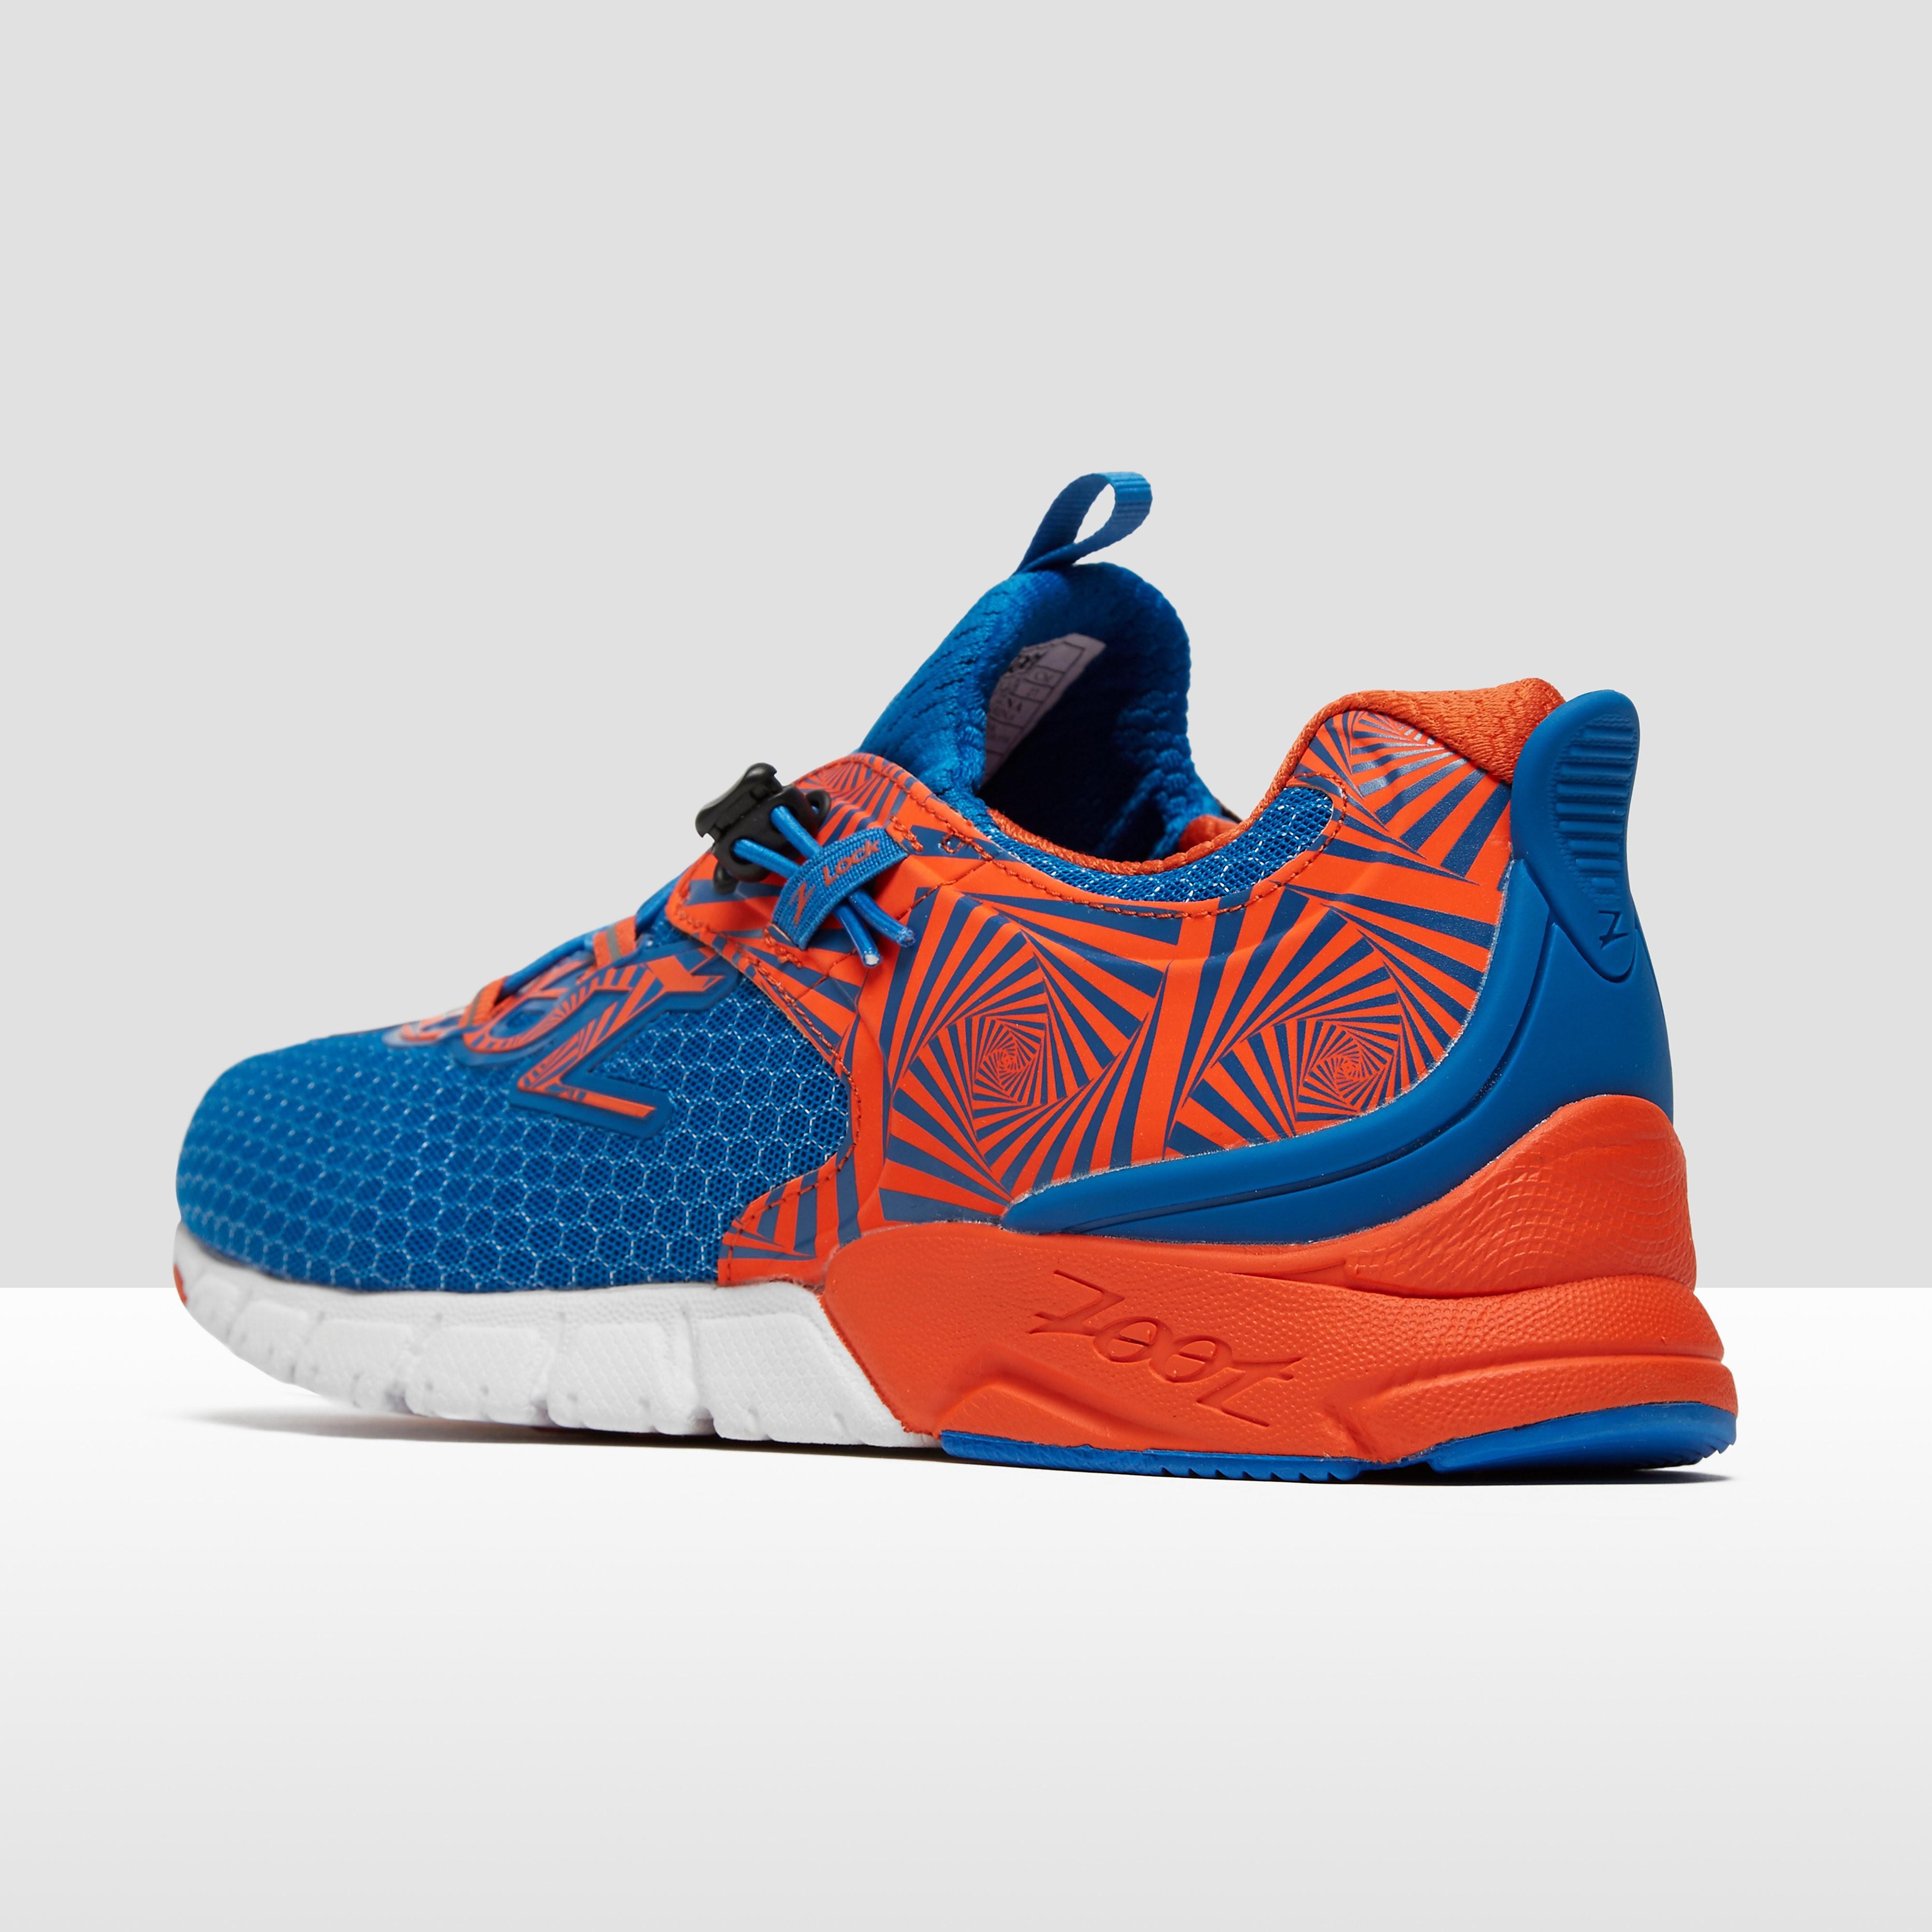 Zoot Men's Makai Running Shoes